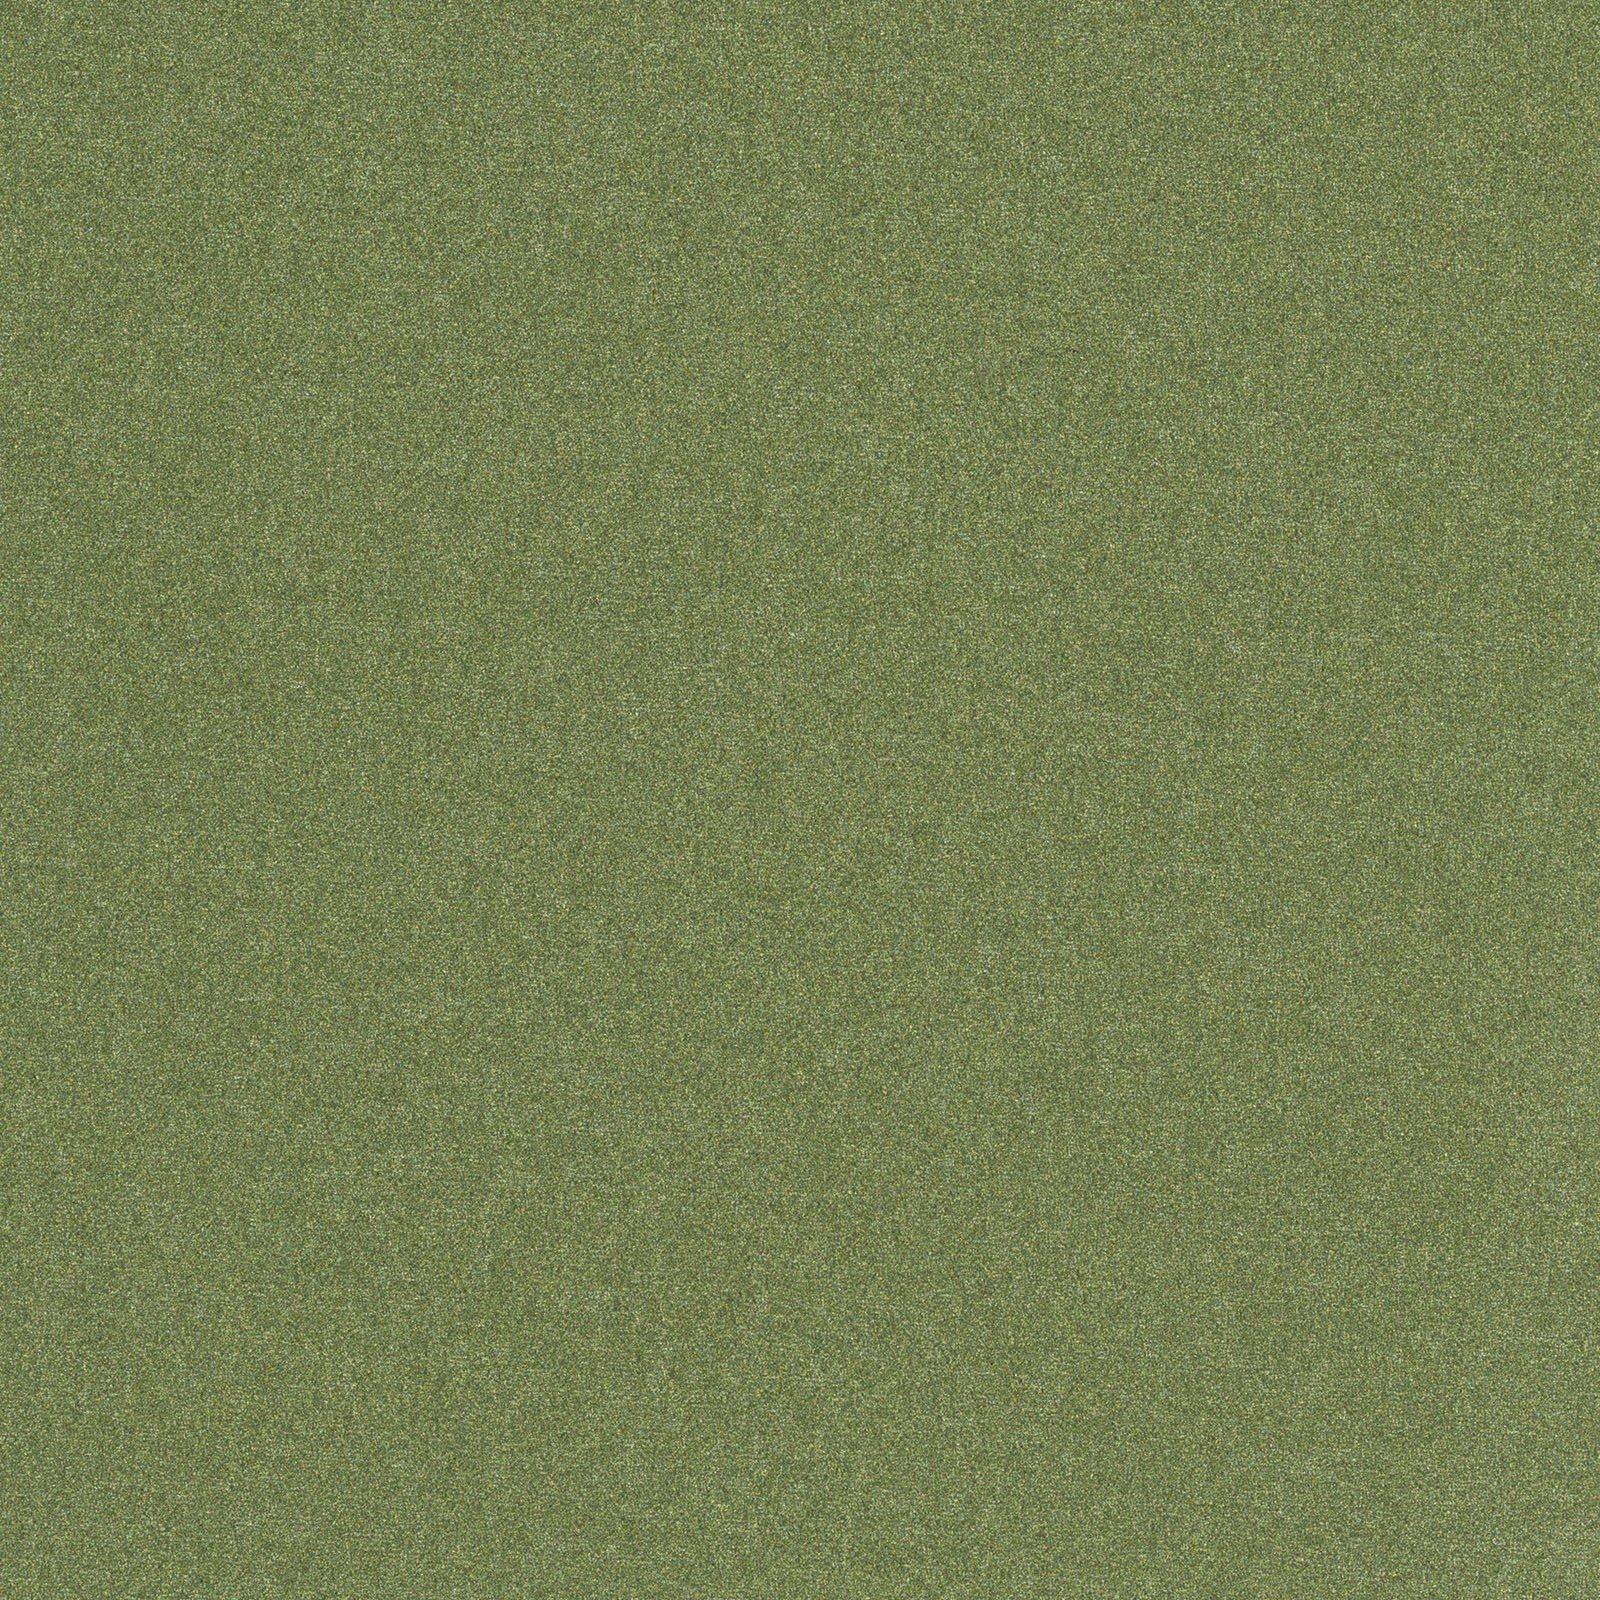 Starlight Metallics - Emerald